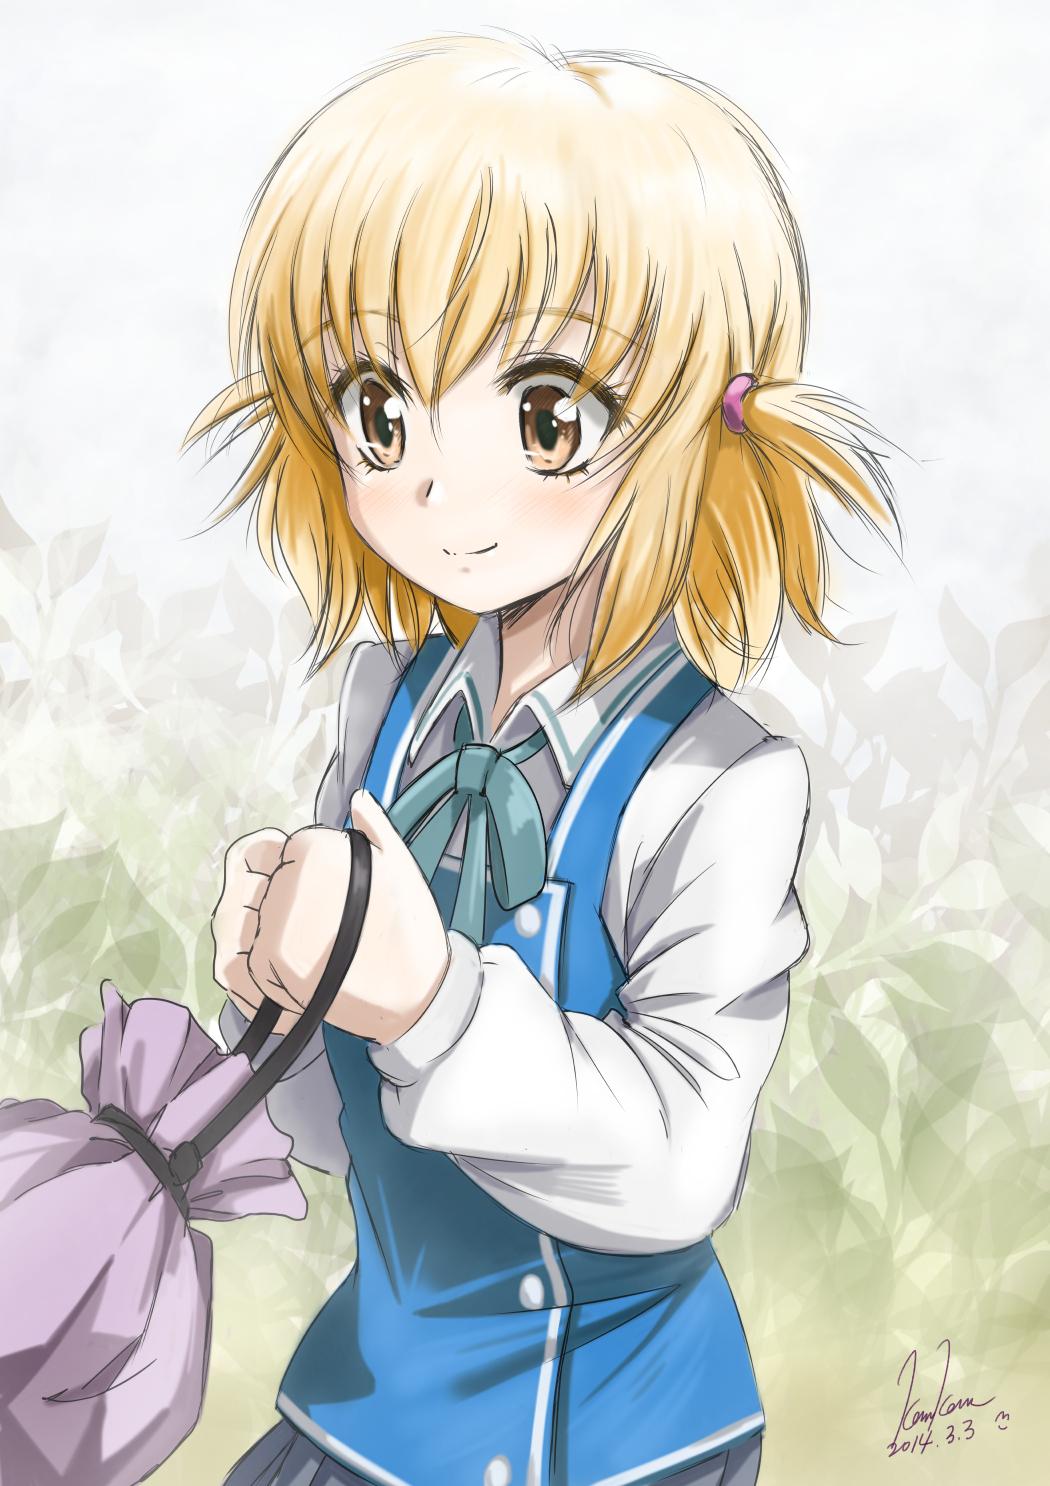 D Frag Anime Characters Database : D frag zerochan anime image board